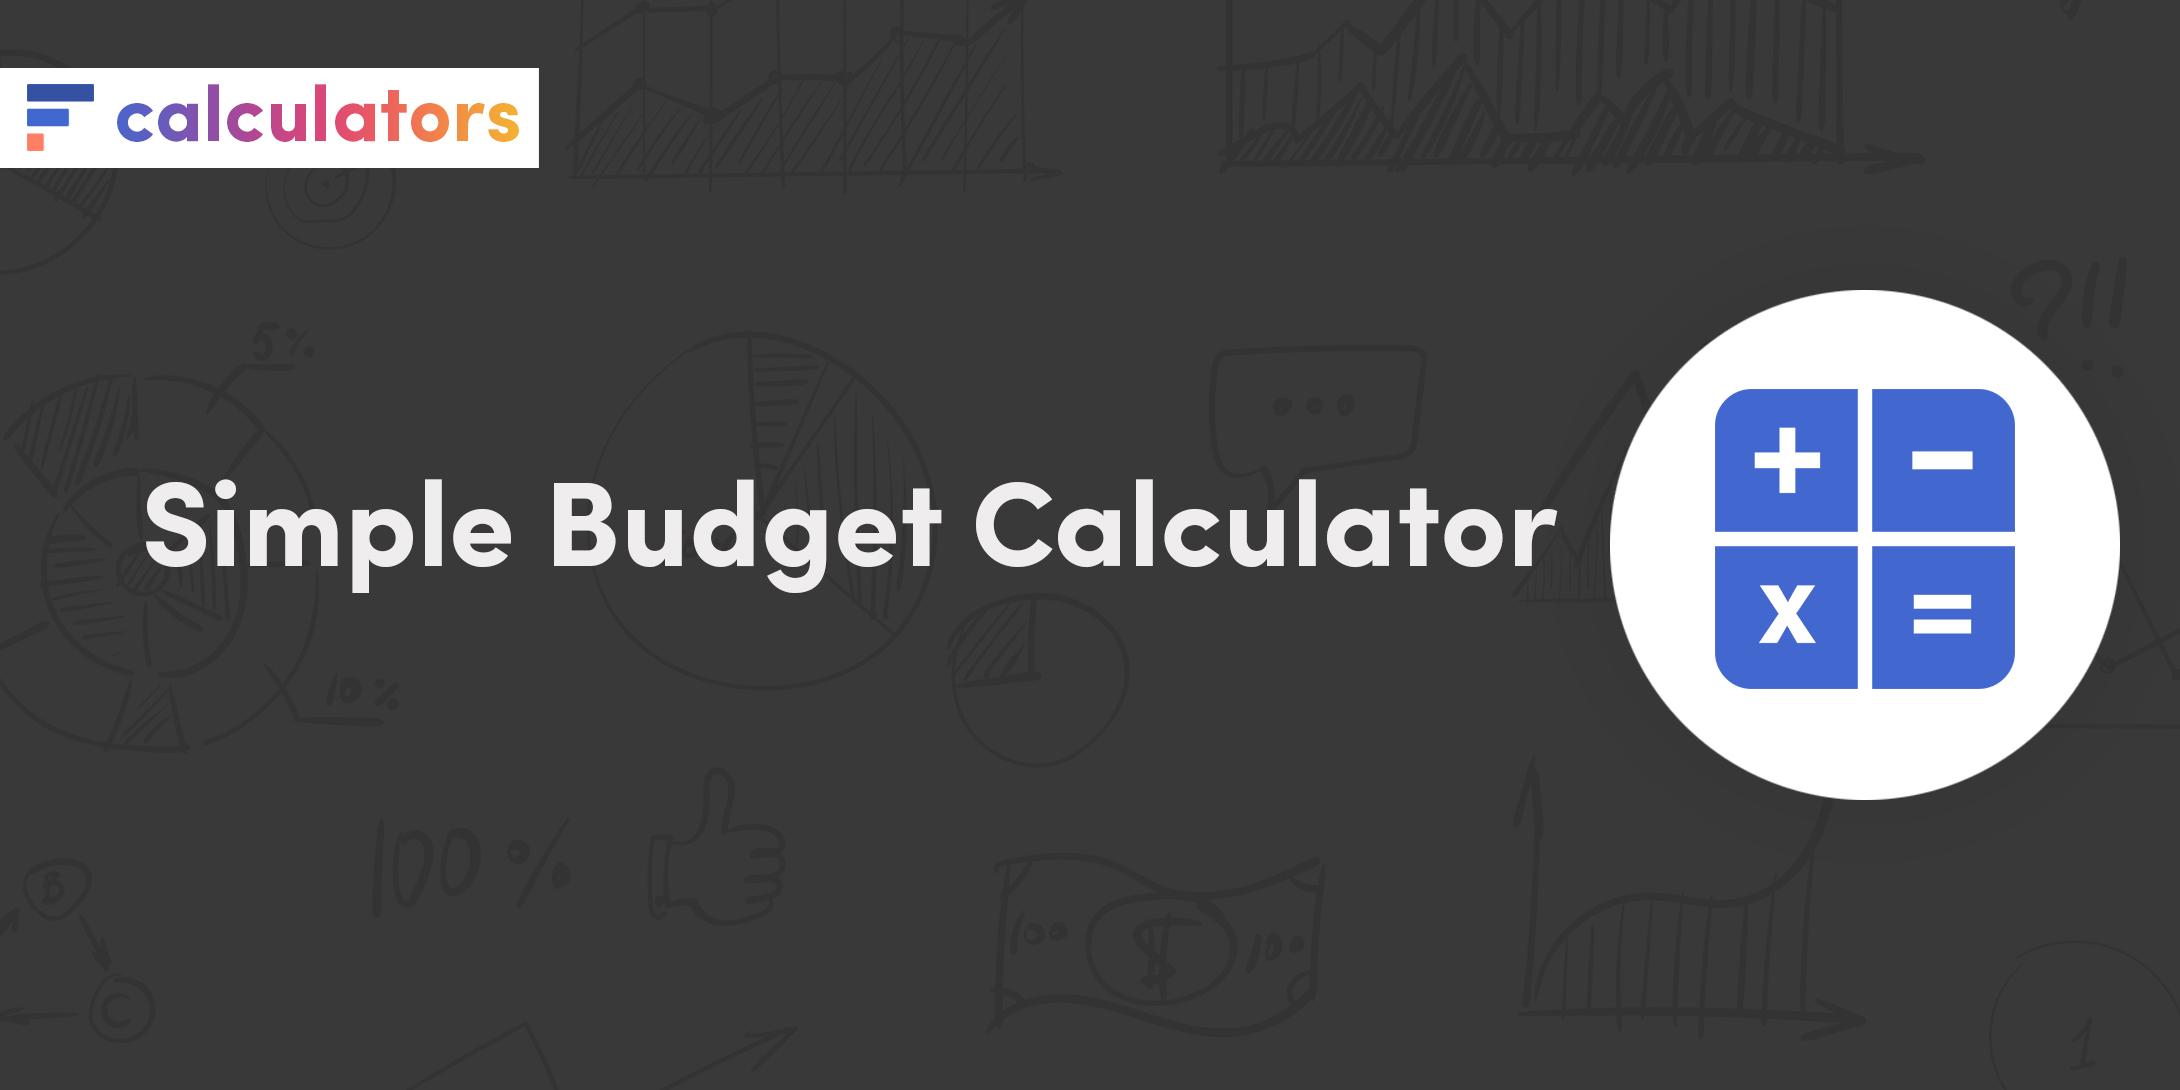 Simple budget calculator